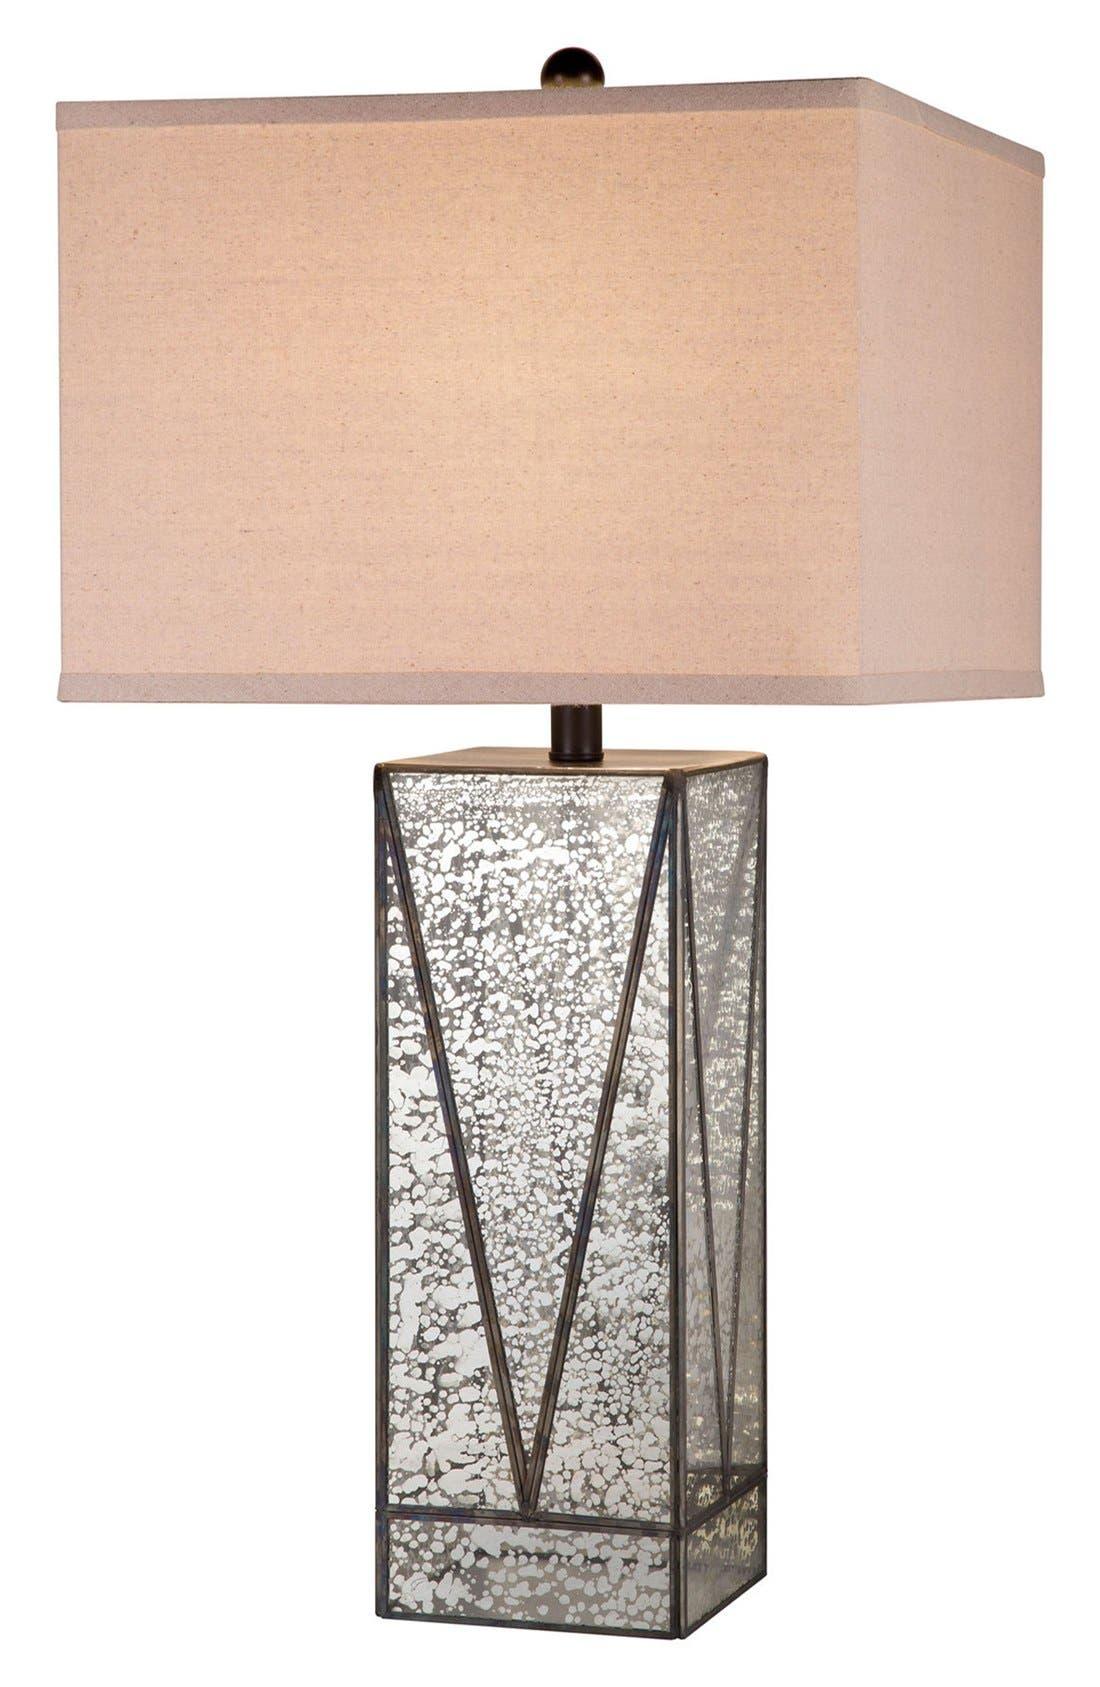 JAlexander Mercury Glass Table Lamp,                             Main thumbnail 1, color,                             SILVER/ BLACK